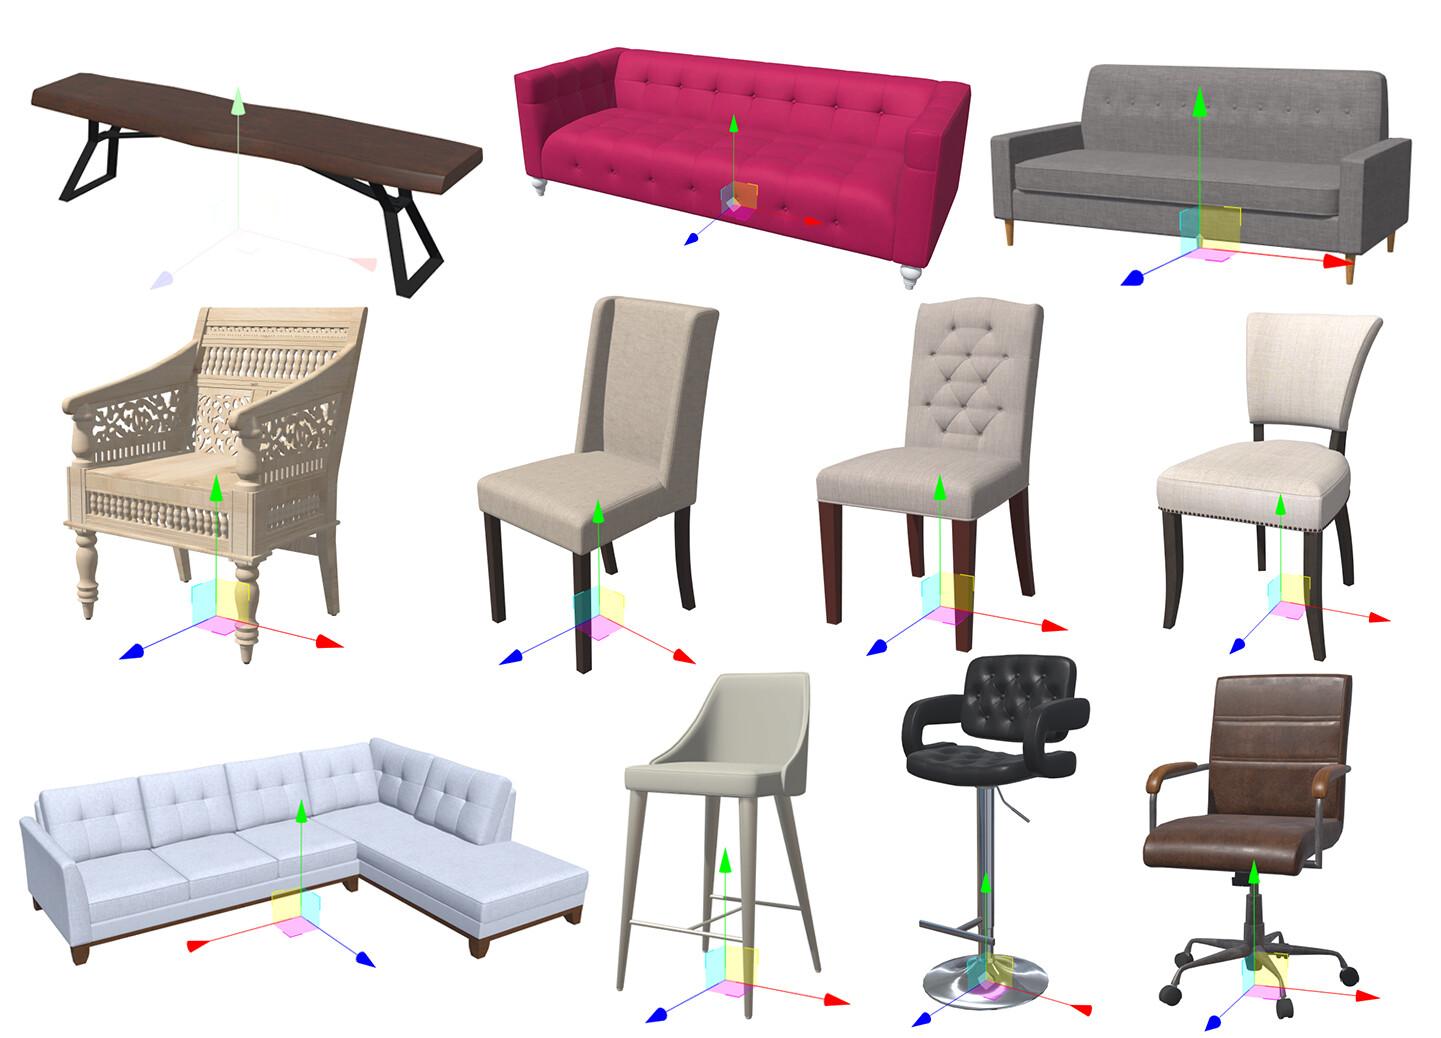 Cherlin mao houzz portfolio chairs